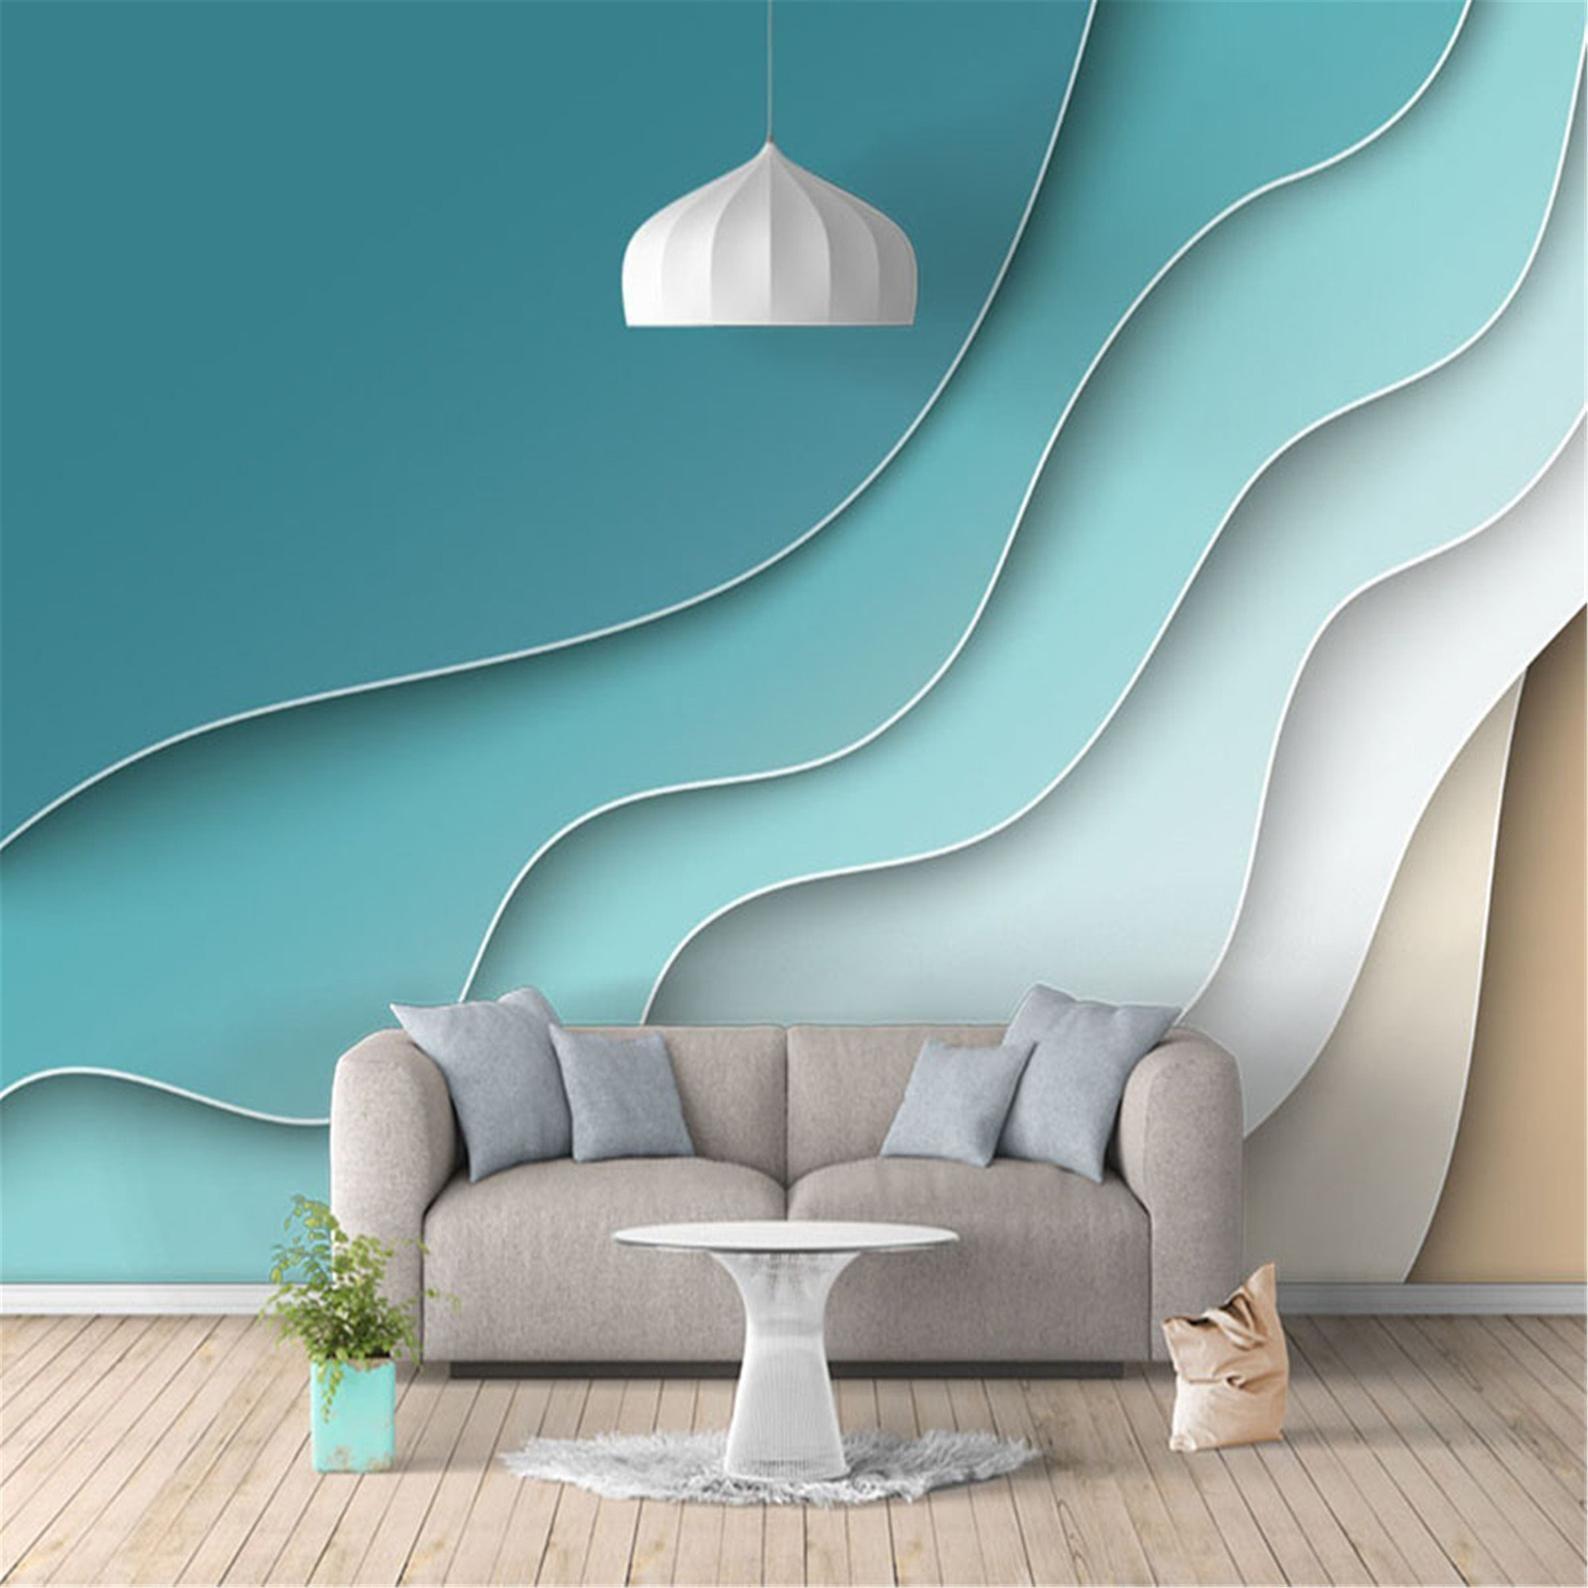 3D Wallpaper Modern Abstract Line Geometric Pattern Photo